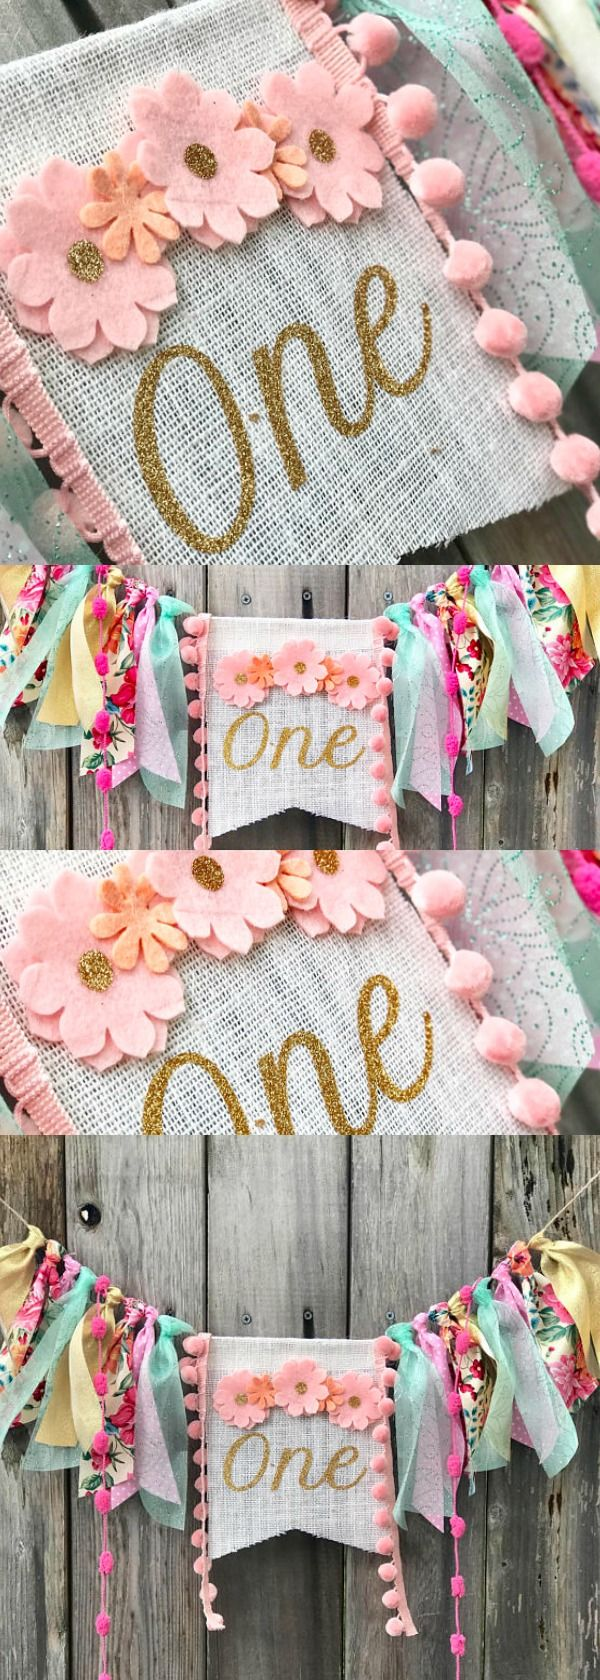 First Birthday High Chair Banner. Boho 1st Birthday. Girl's First Birthday Decor. Adorable Felt Flower Birthday Banner. This is so cute! #boho #bohostyle #banners #1stbirthday #birthdayparty #party #partydecor #partydecorations #etsyfinds #affiliatelink